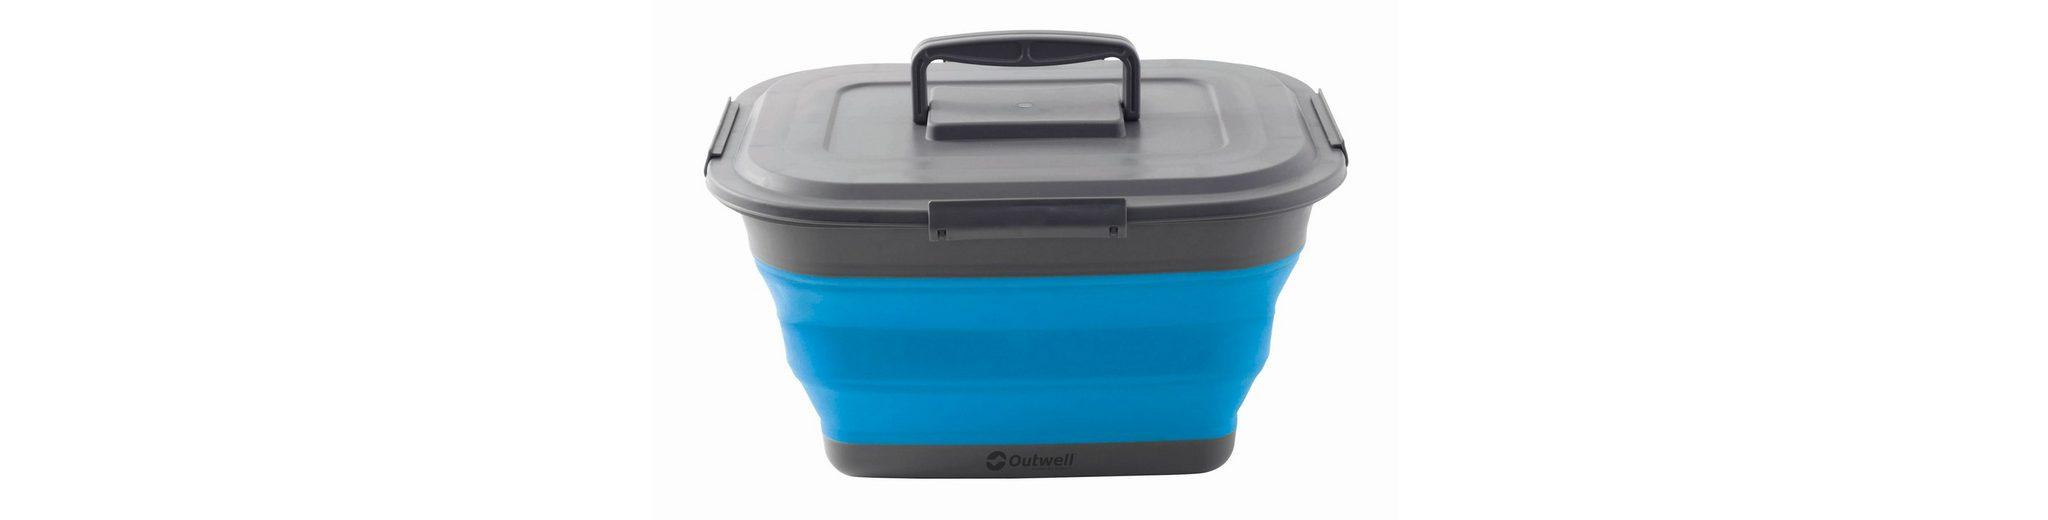 Outwell Campingtruhe & -Kiste »Collaps Storage Box L«